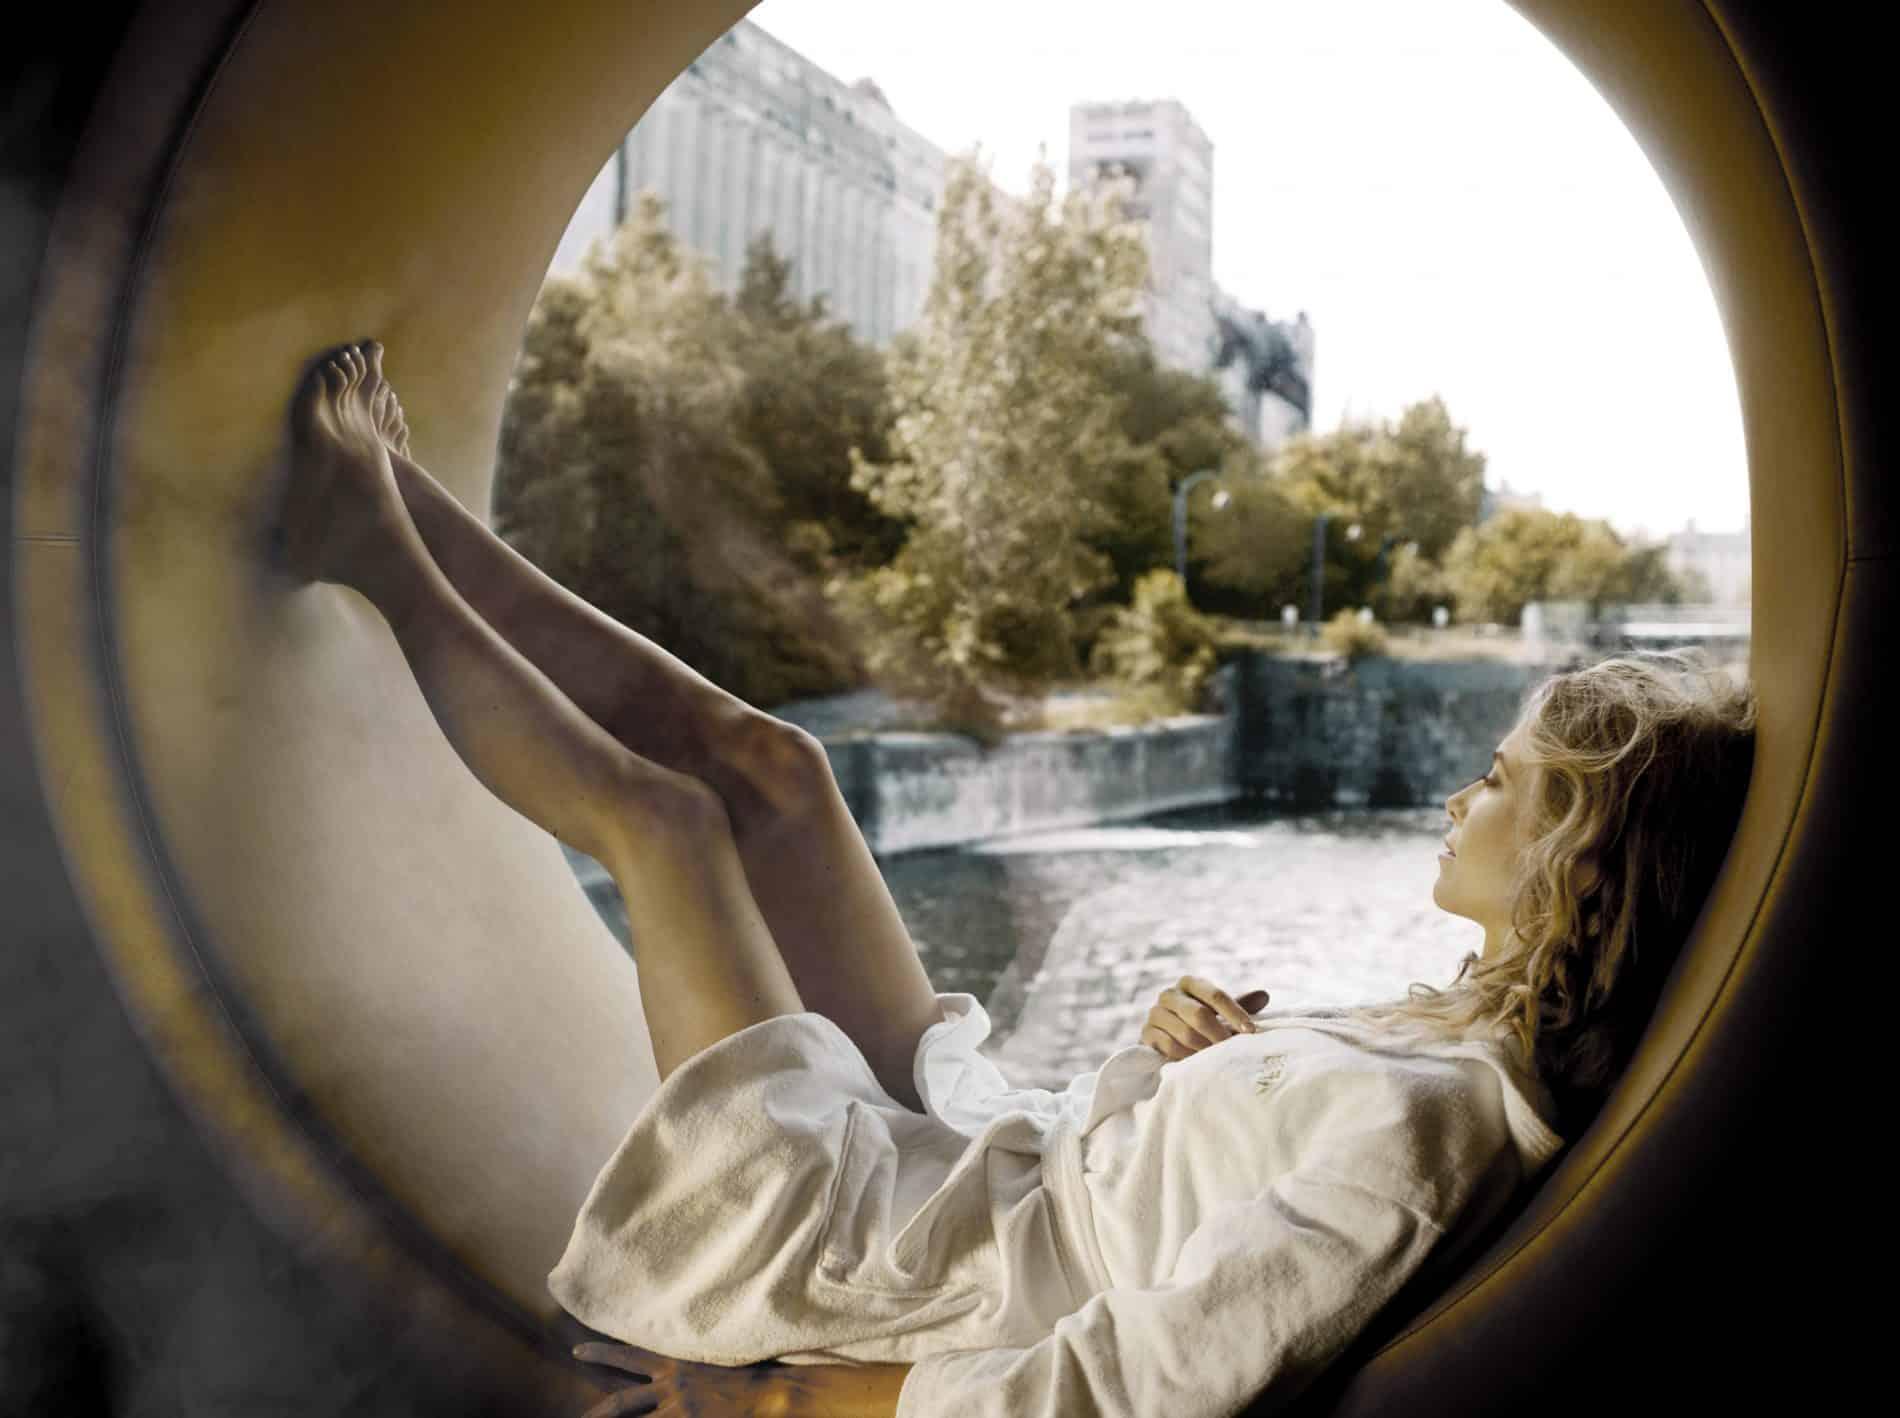 montreal-spa-bota-bota-mademoiselle voyage-60